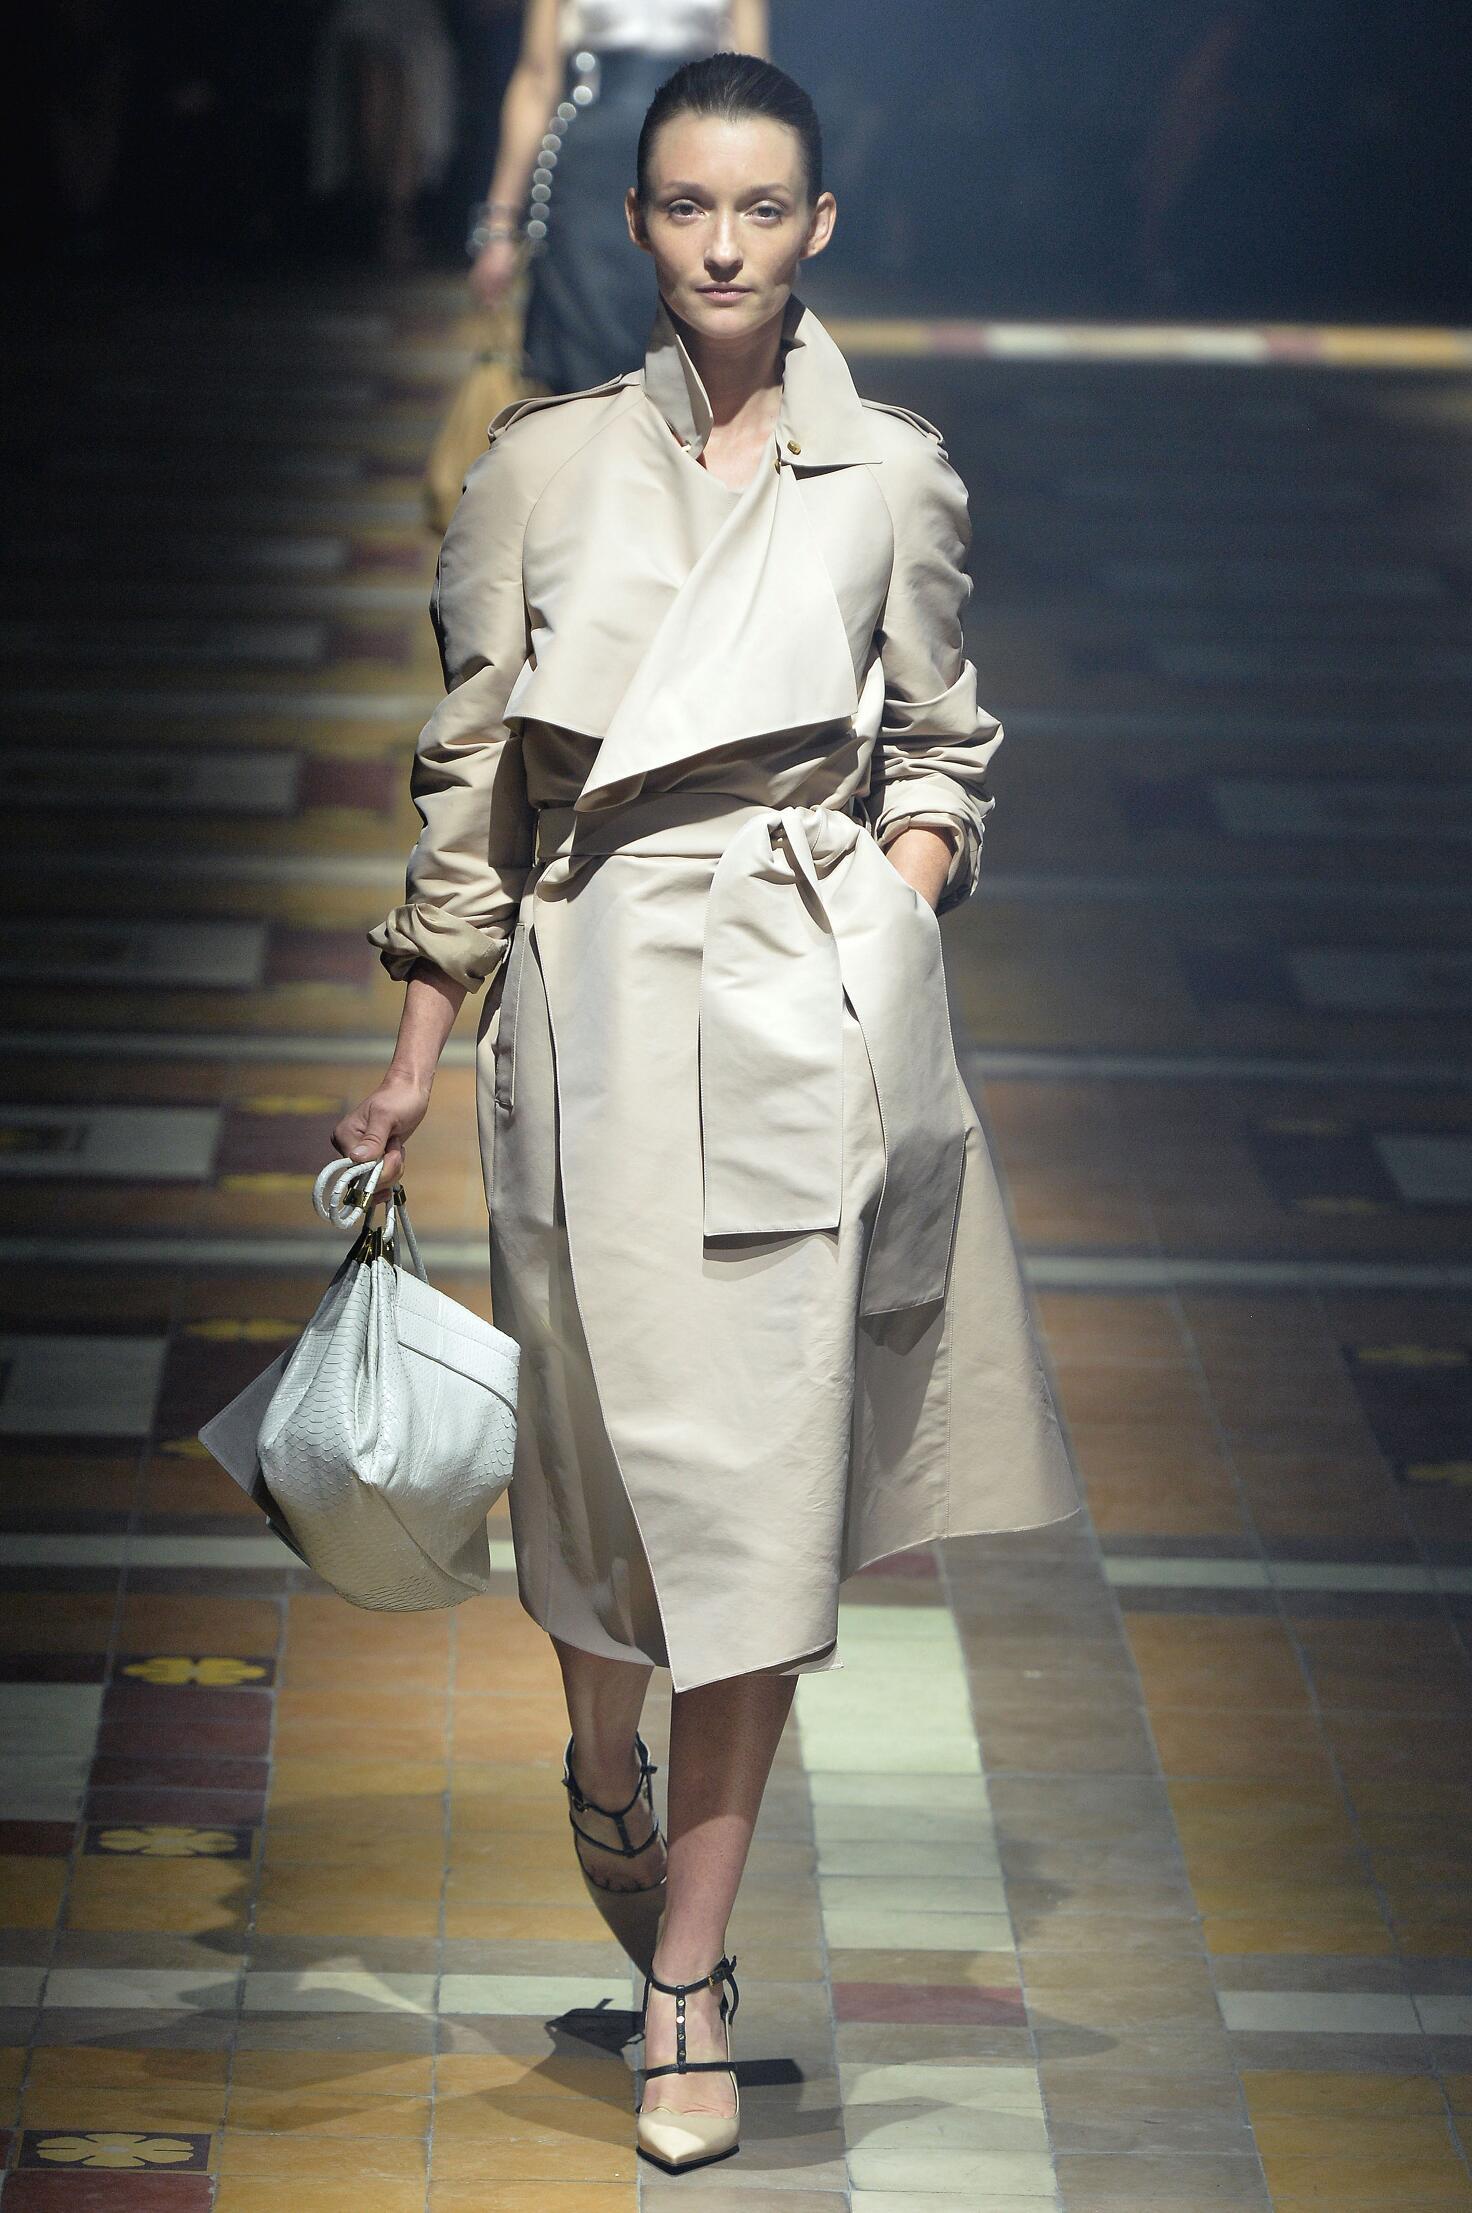 Fashion Model Lanvin Catwalk